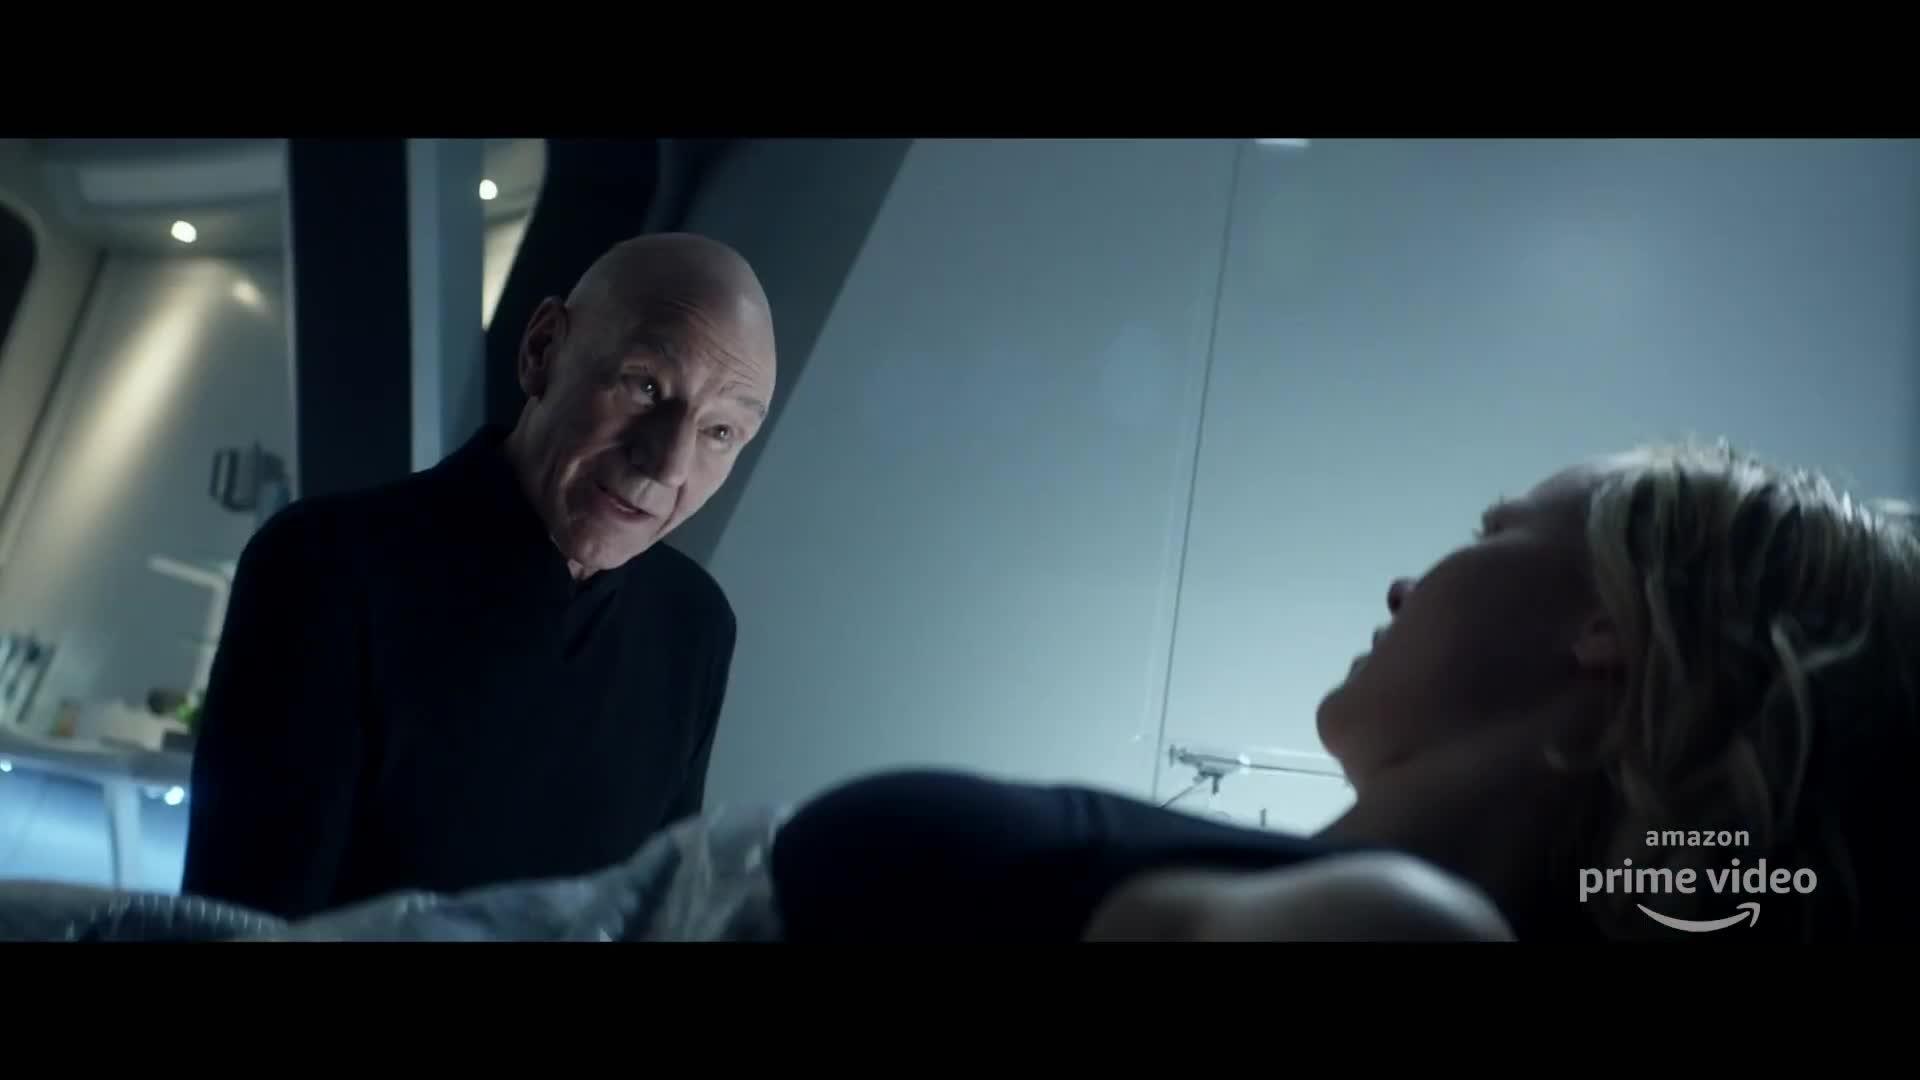 Trailer, Amazon, Serie, Amazon Prime, Teaser, Star Trek, Amazon Prime Video, Prime Video, Jean Luc Picard, Picard, Star Trek Picard, Star Trek:Picard, Star Trek: Picard